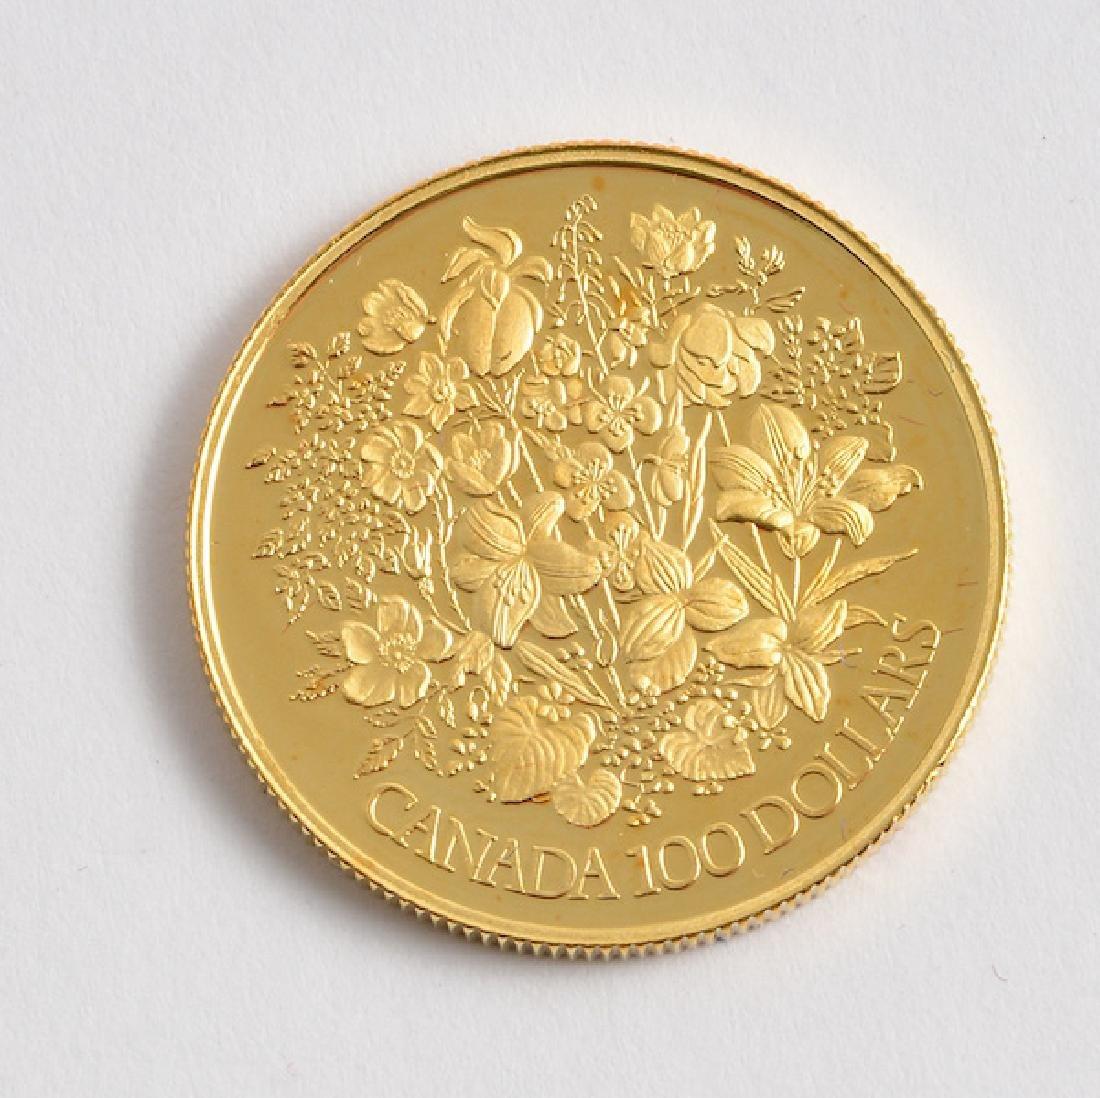 CANADIAN 100$ - 22K GOLD - 1977